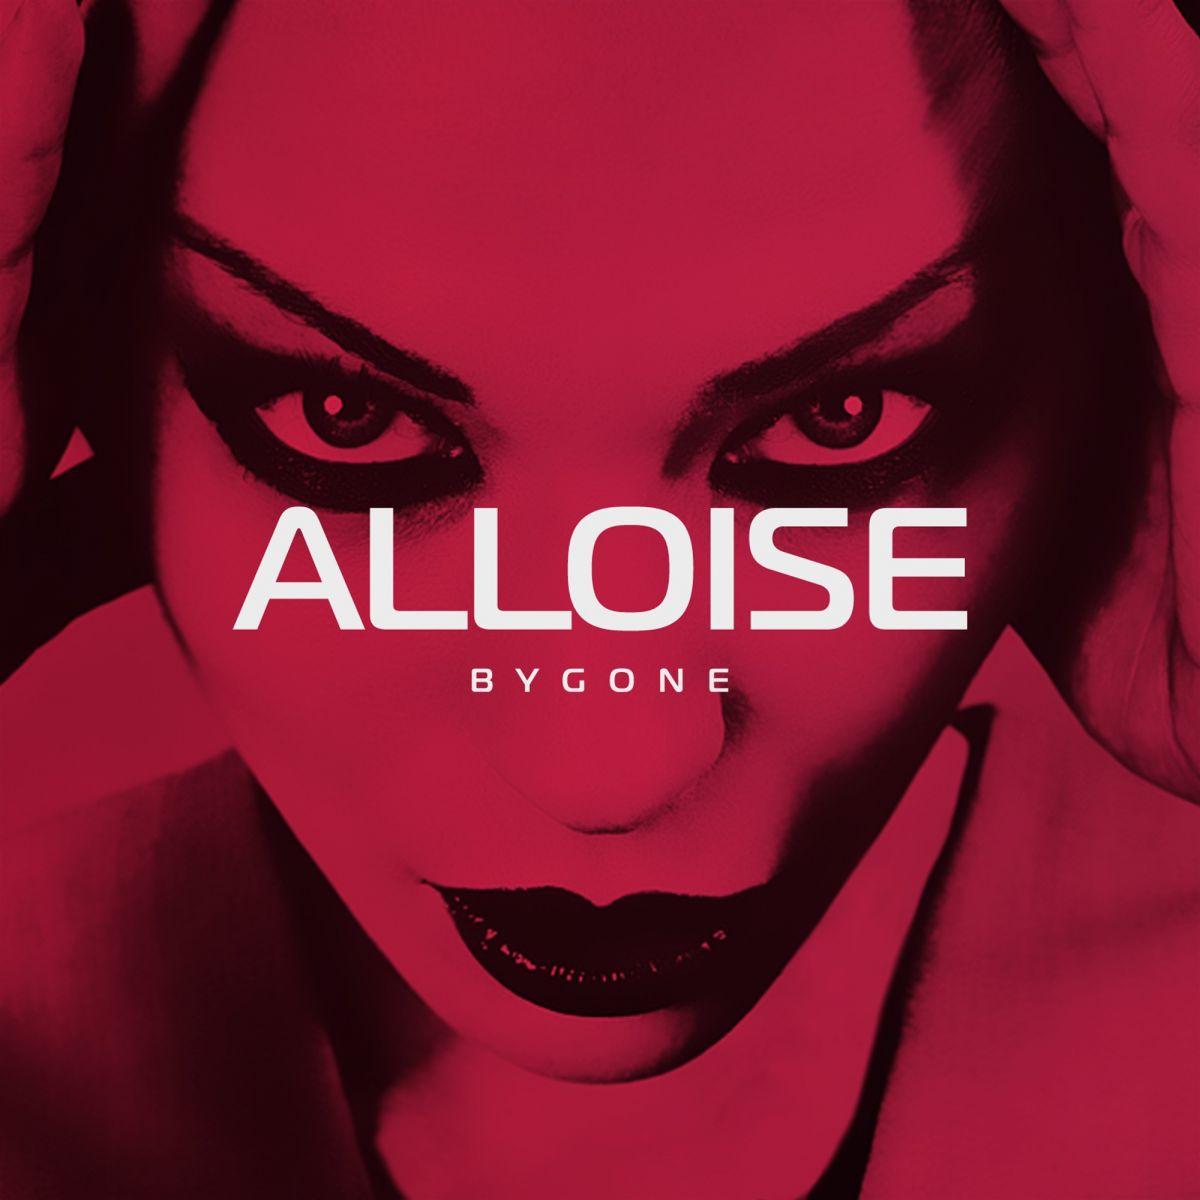 Alloise